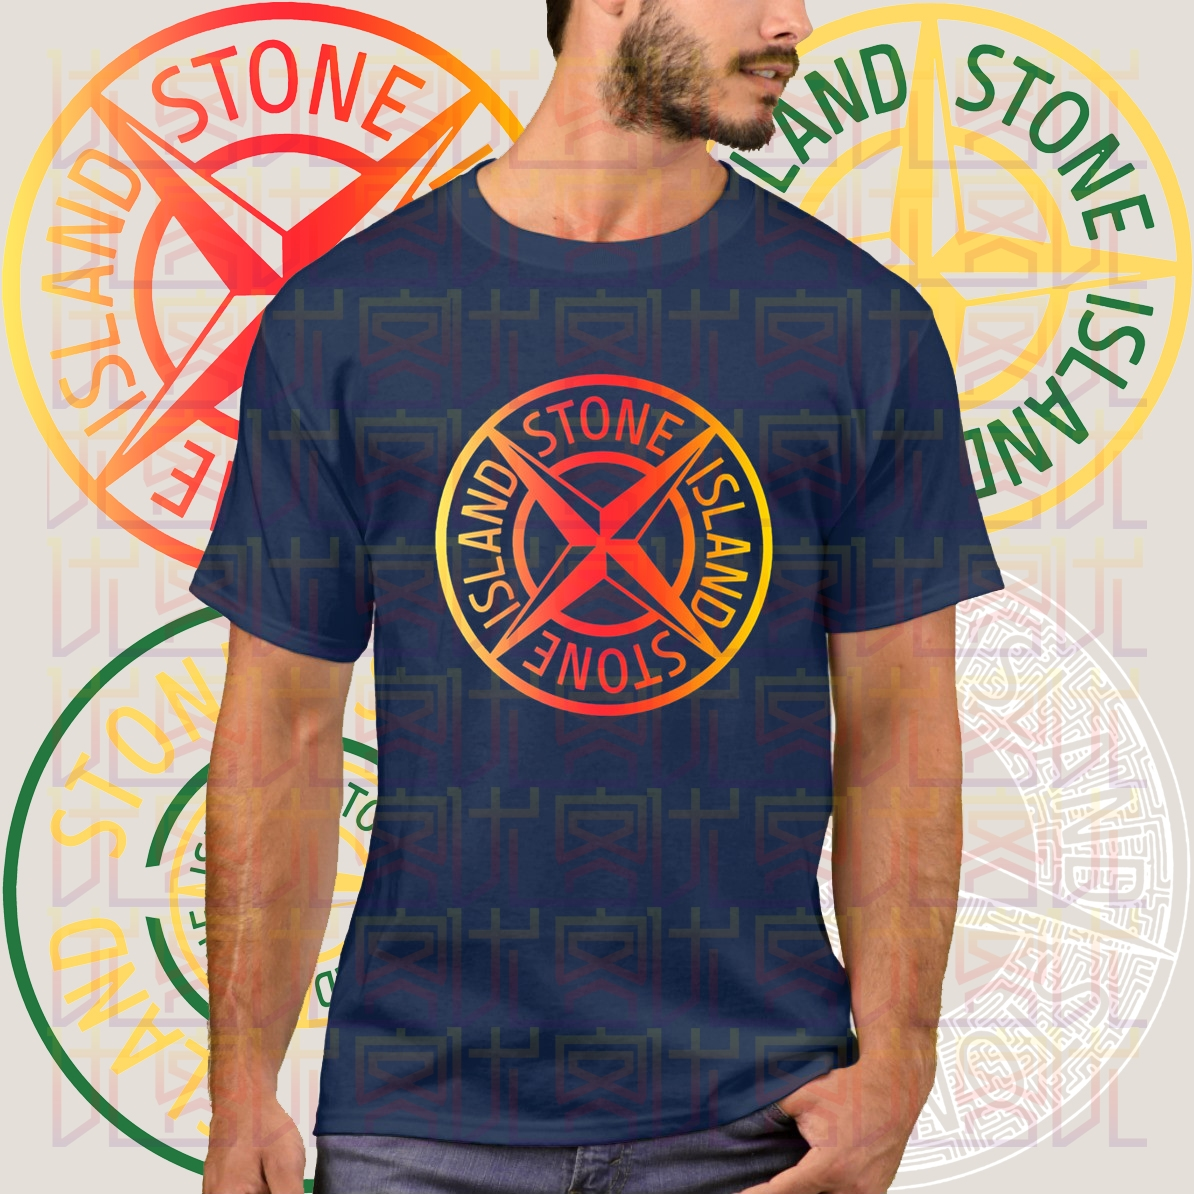 2020 New Stone-Island Logo Summer Print Navy T-Shirt Clothes Popular Shirt Cotton Tees Amazing Short Sleeve Unique For Men Tops